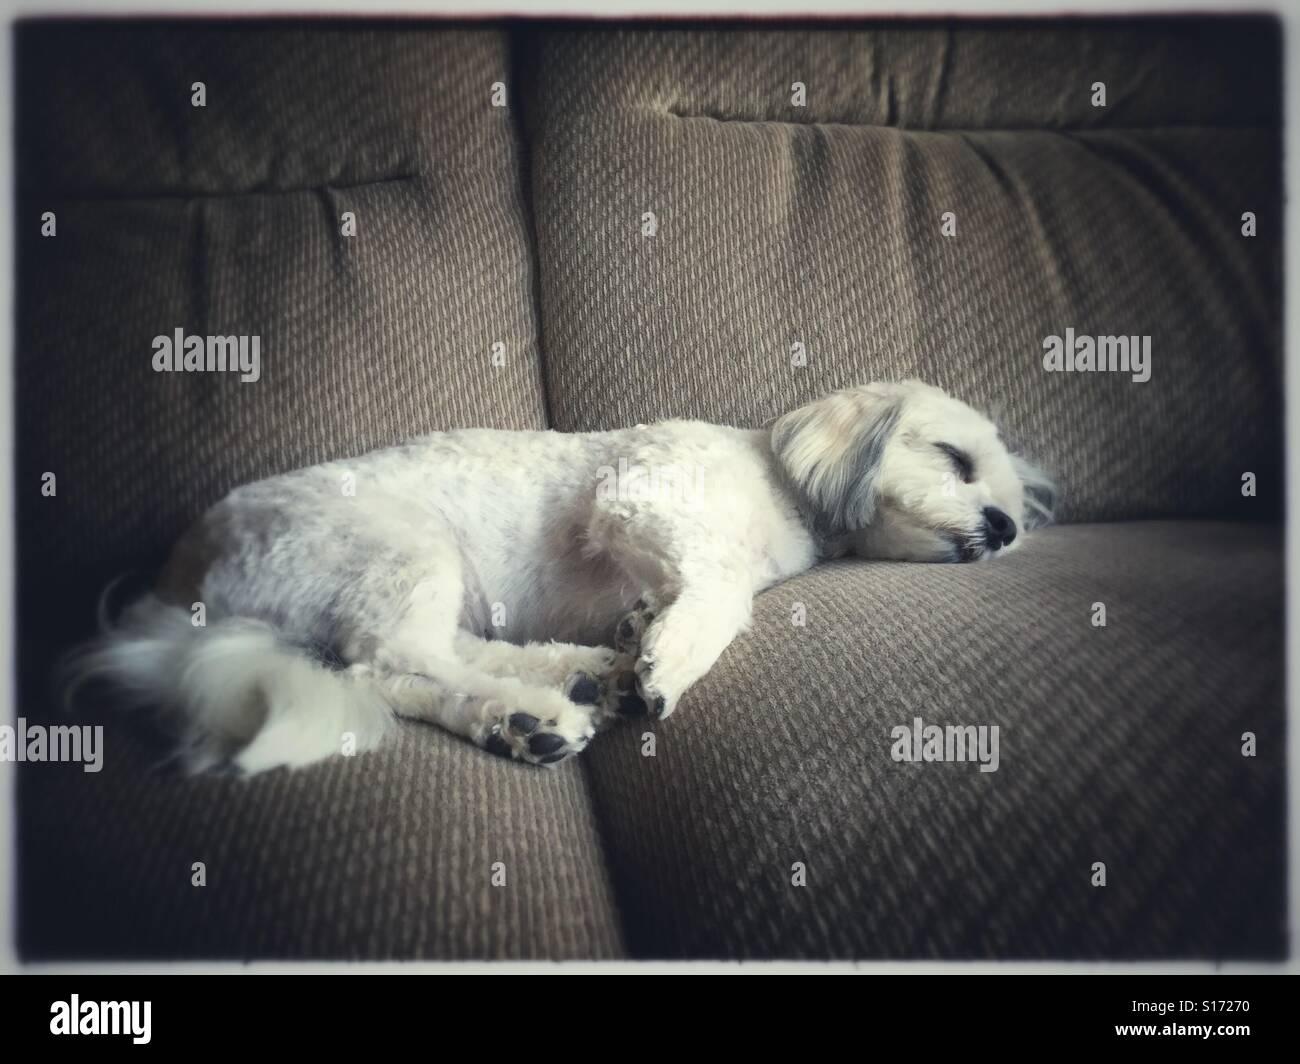 Zuchon mixed breed dog asleep on cushy sofa, USA, December 25, 2015, © Katharine Andriotis - Stock Image